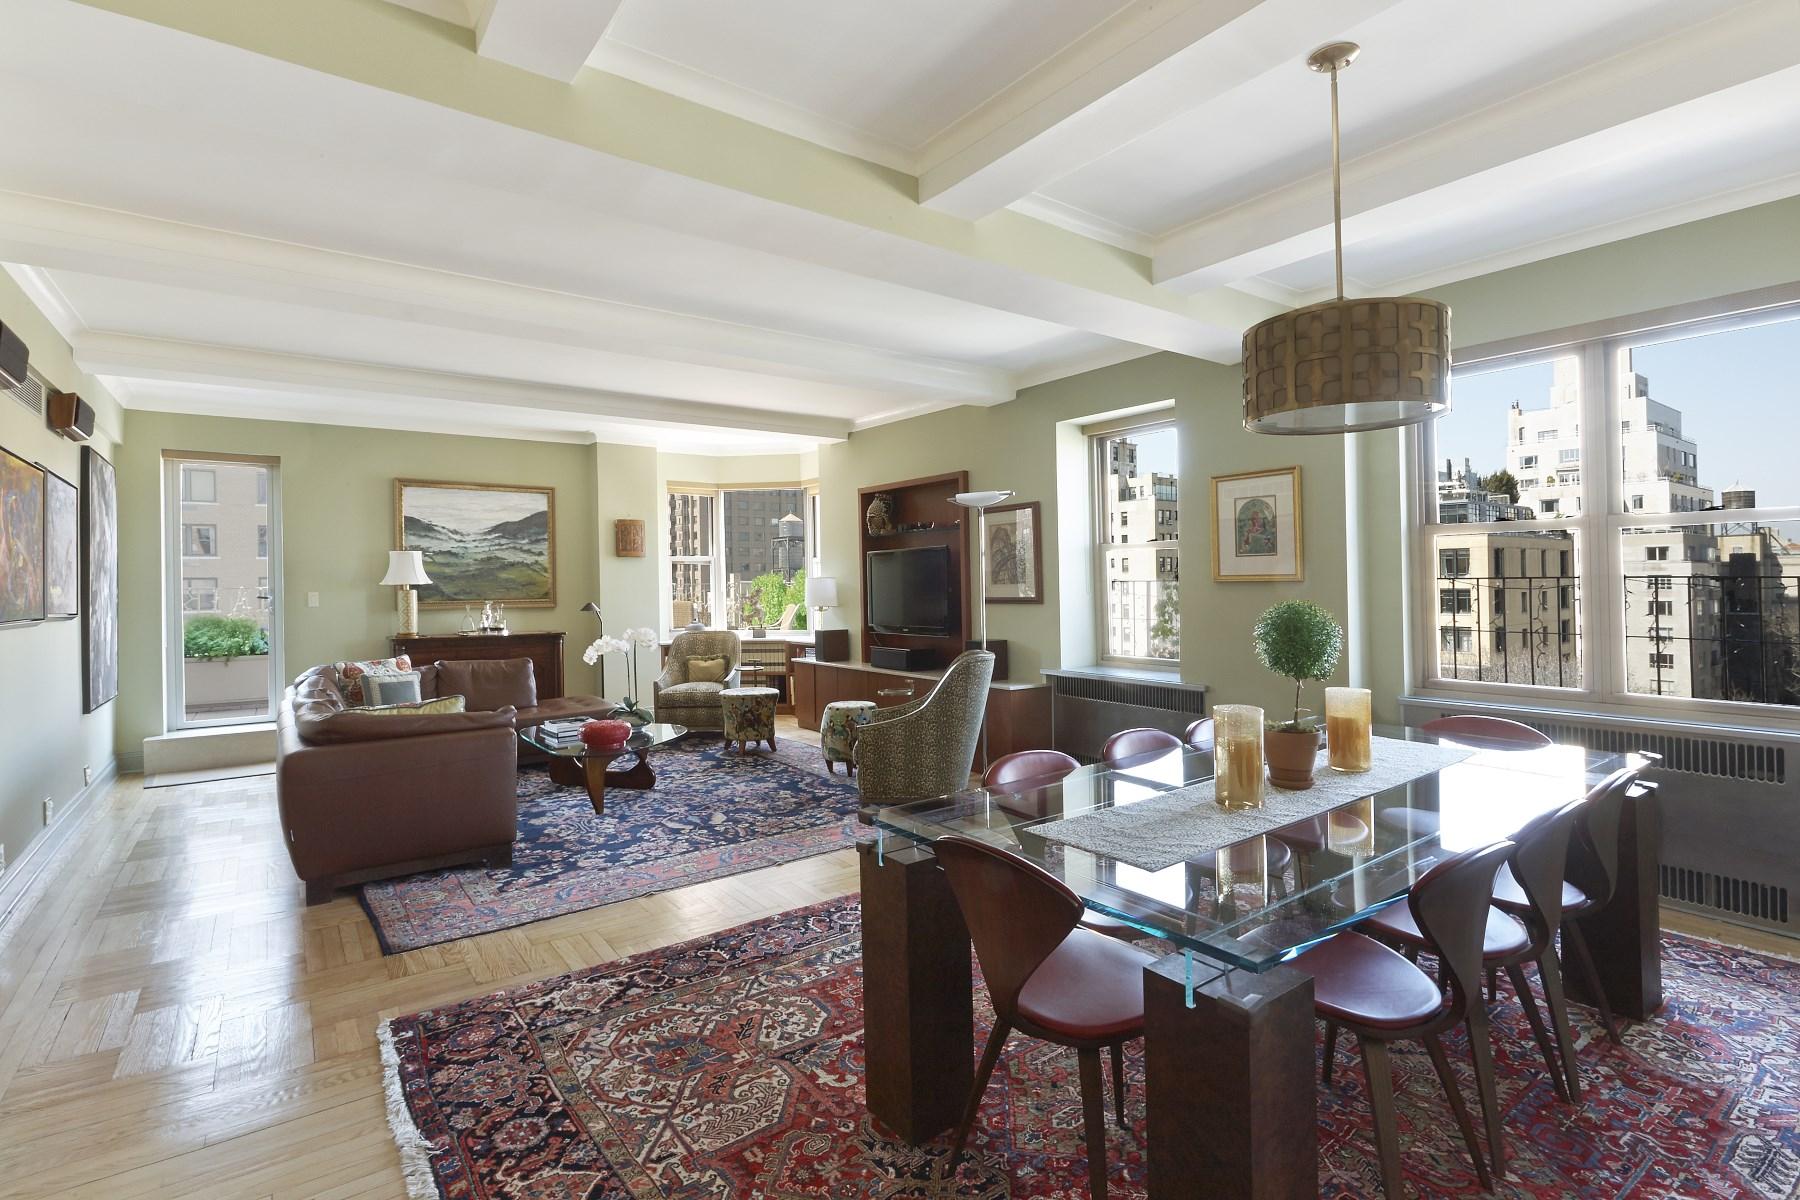 合作公寓 为 销售 在 Prime Park Avenue with Terraces 1150 Park Avenue Apt 10c Upper East Side, New York, 纽约州 10128 美国